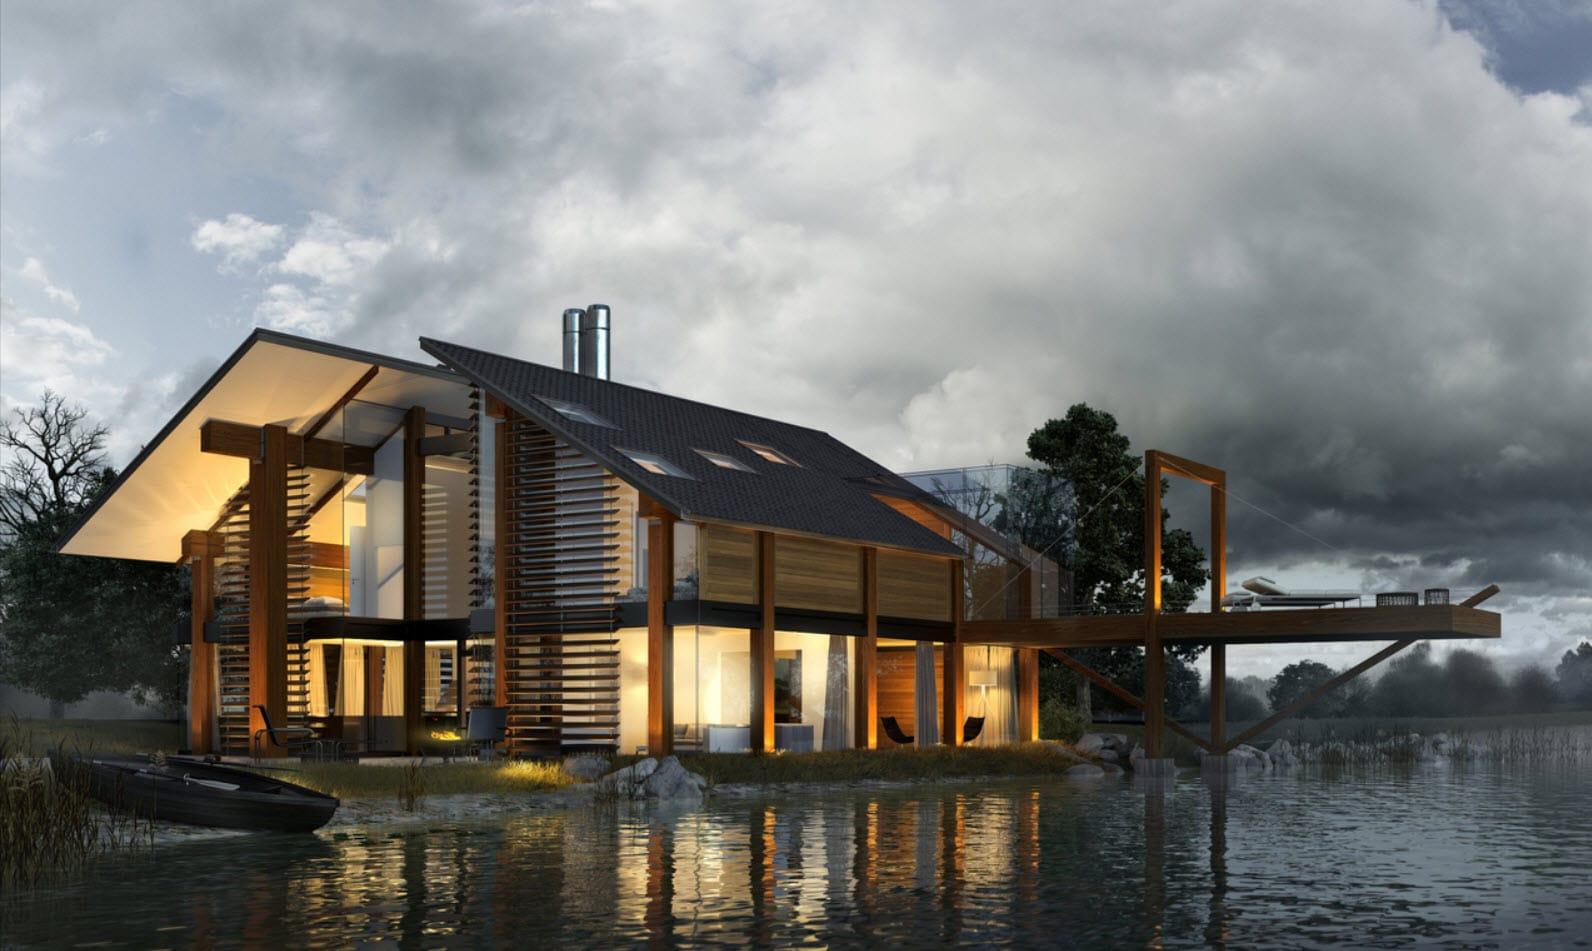 Dise o de casa de madera moderna hermosa fachada for Casa moderna a dos aguas